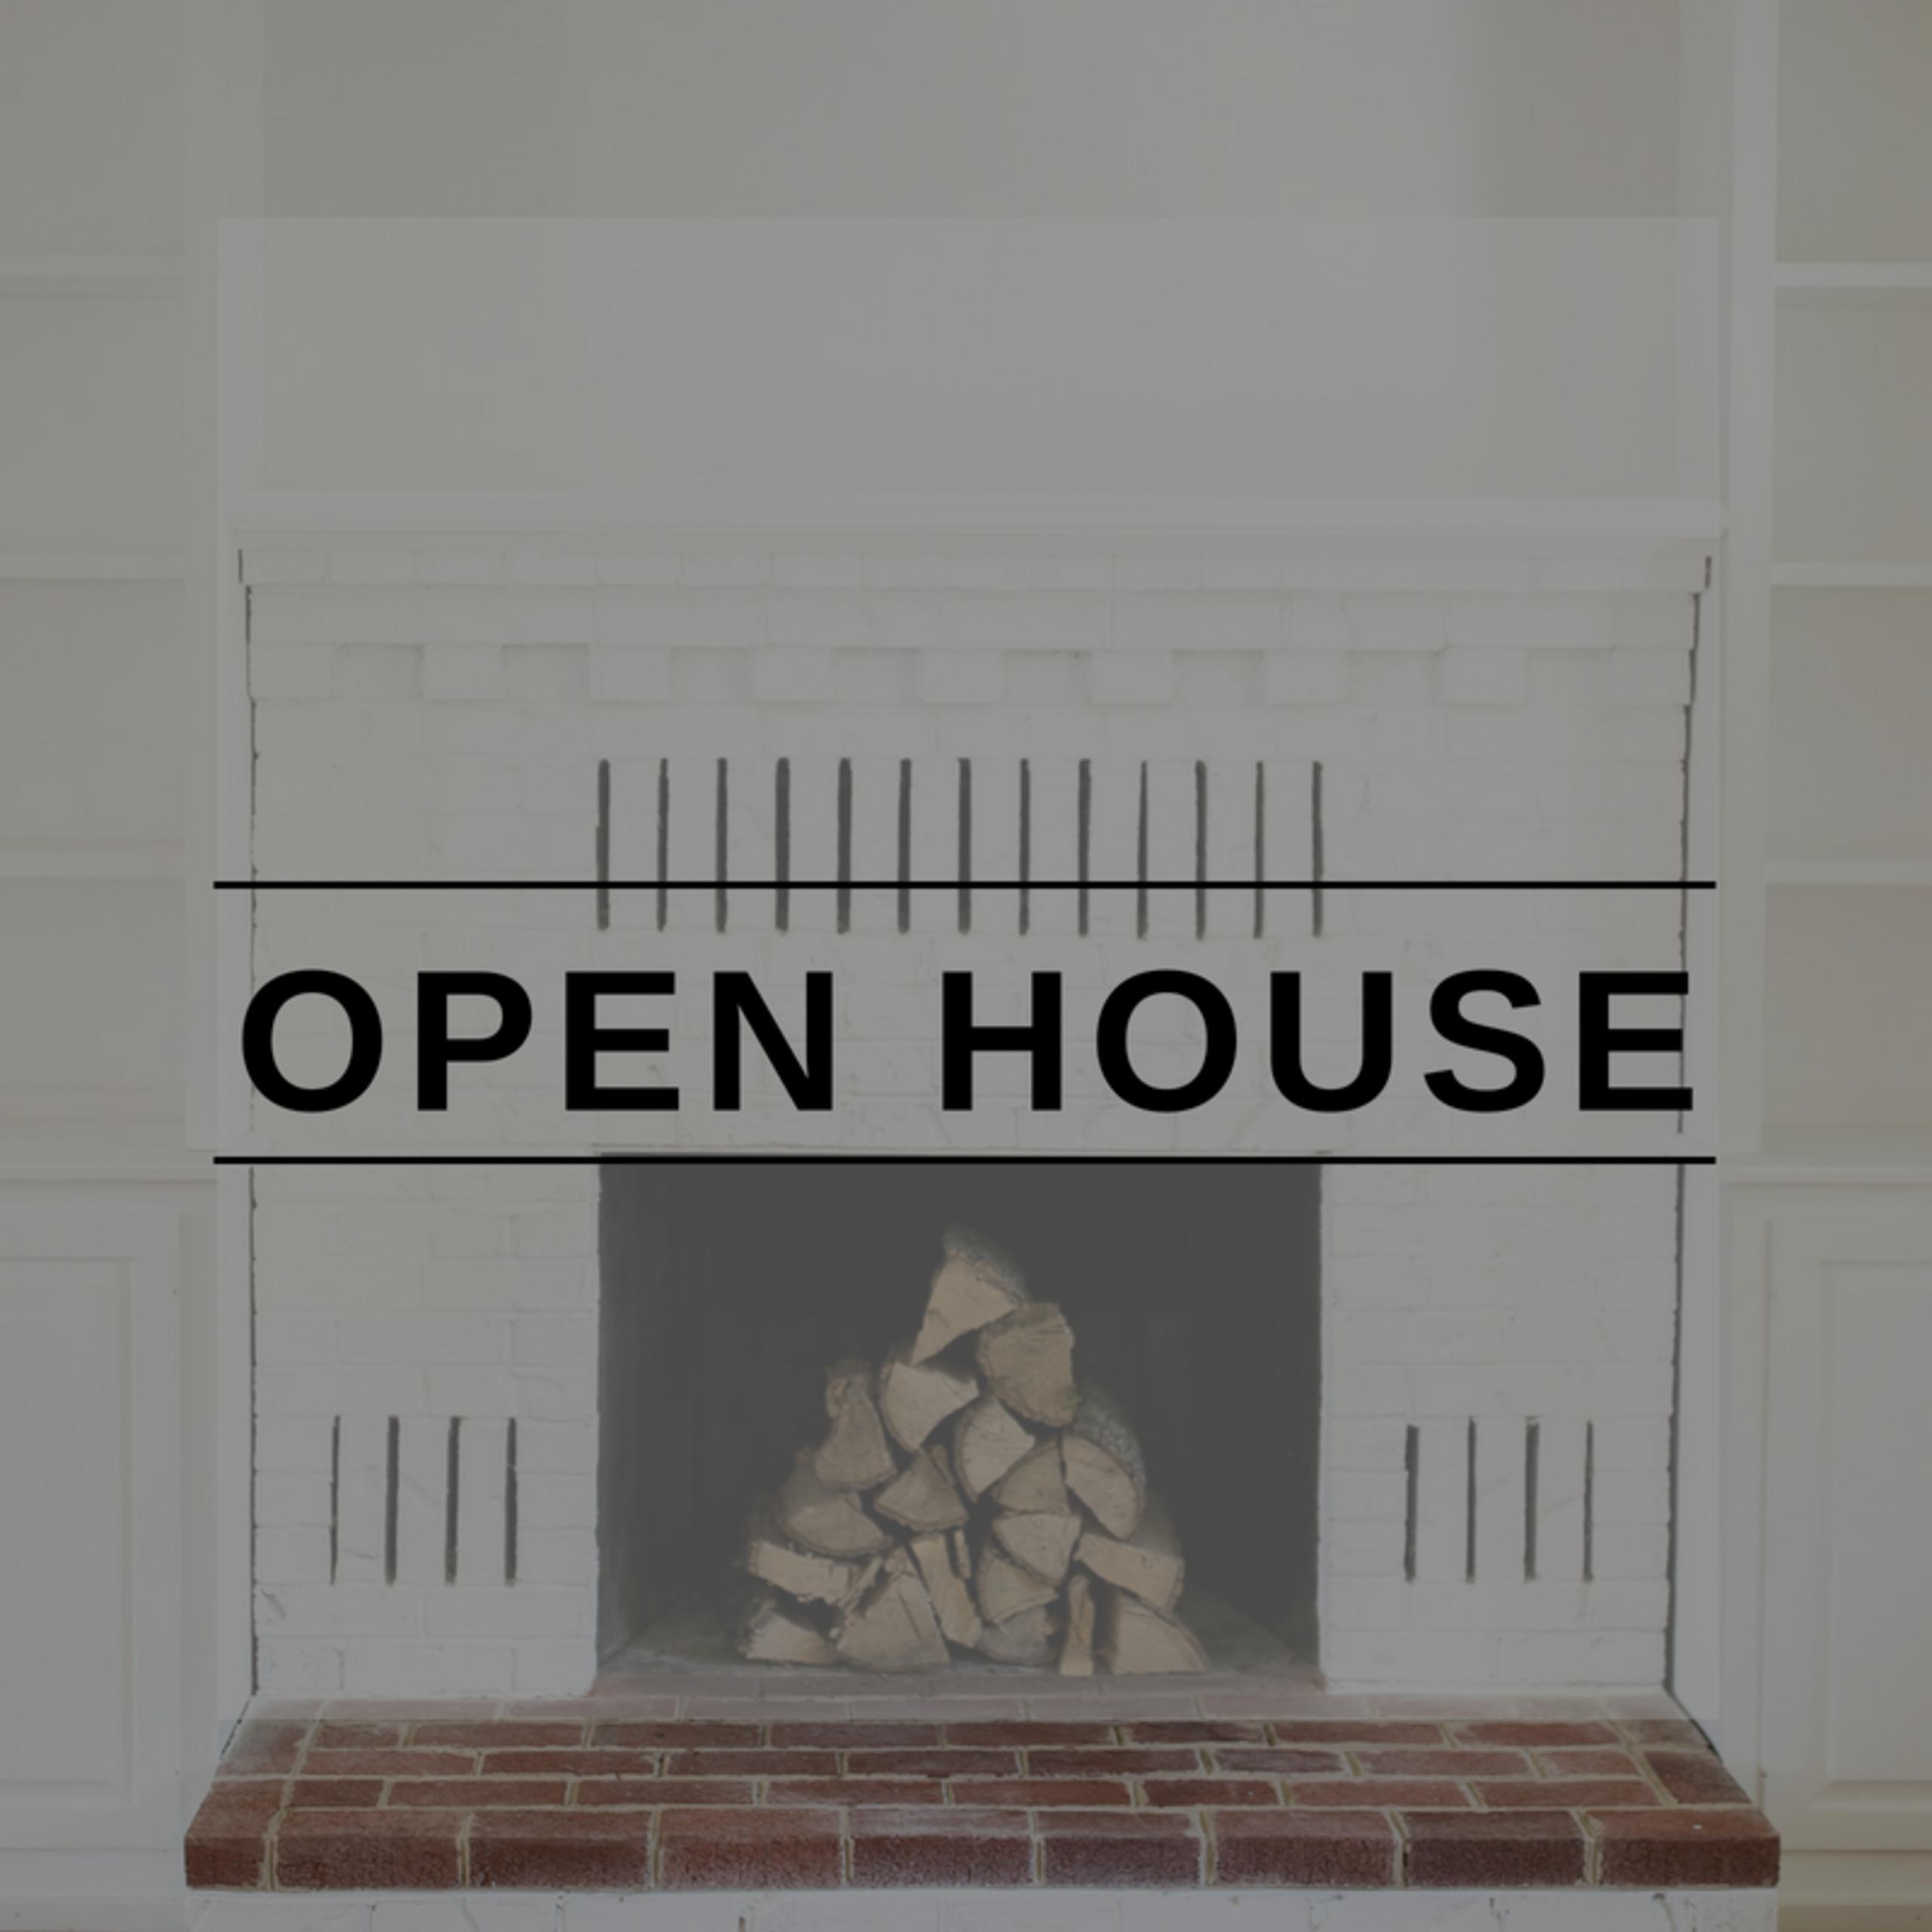 OPEN HOUSE LIST 7/21/18 – 7/22/18